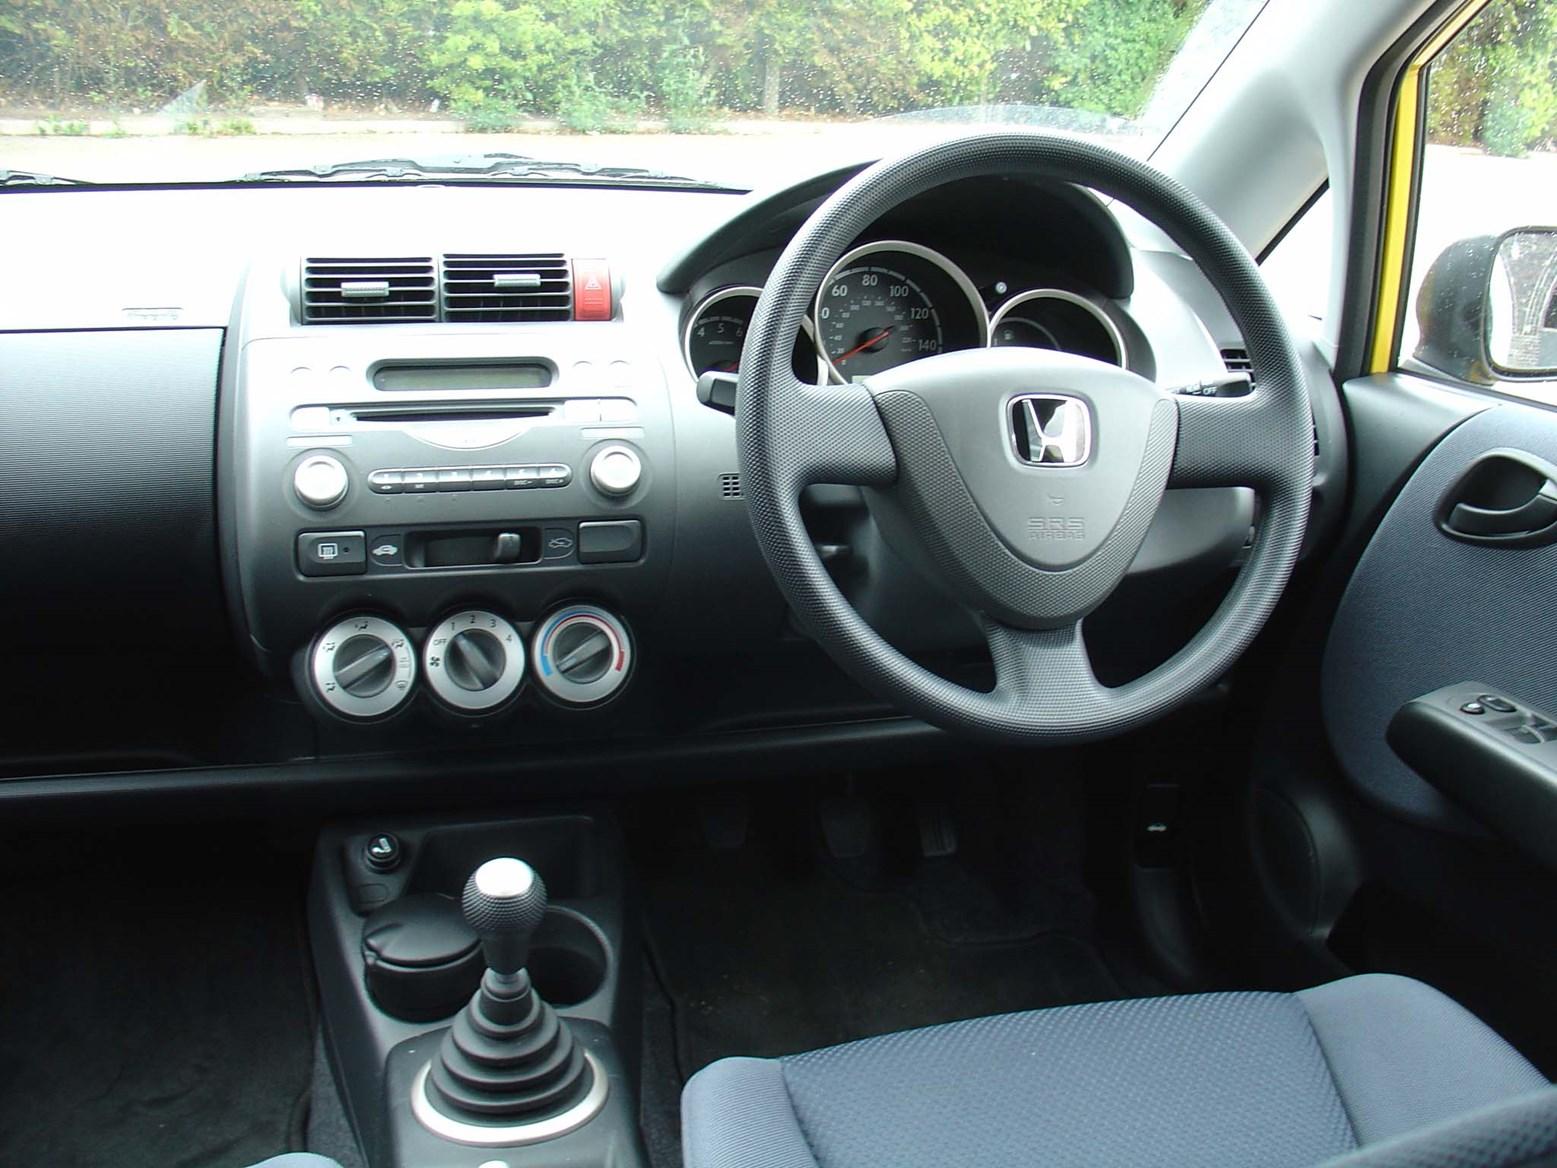 Honda Jazz Hatchback 2002 2008 Features Equipment And